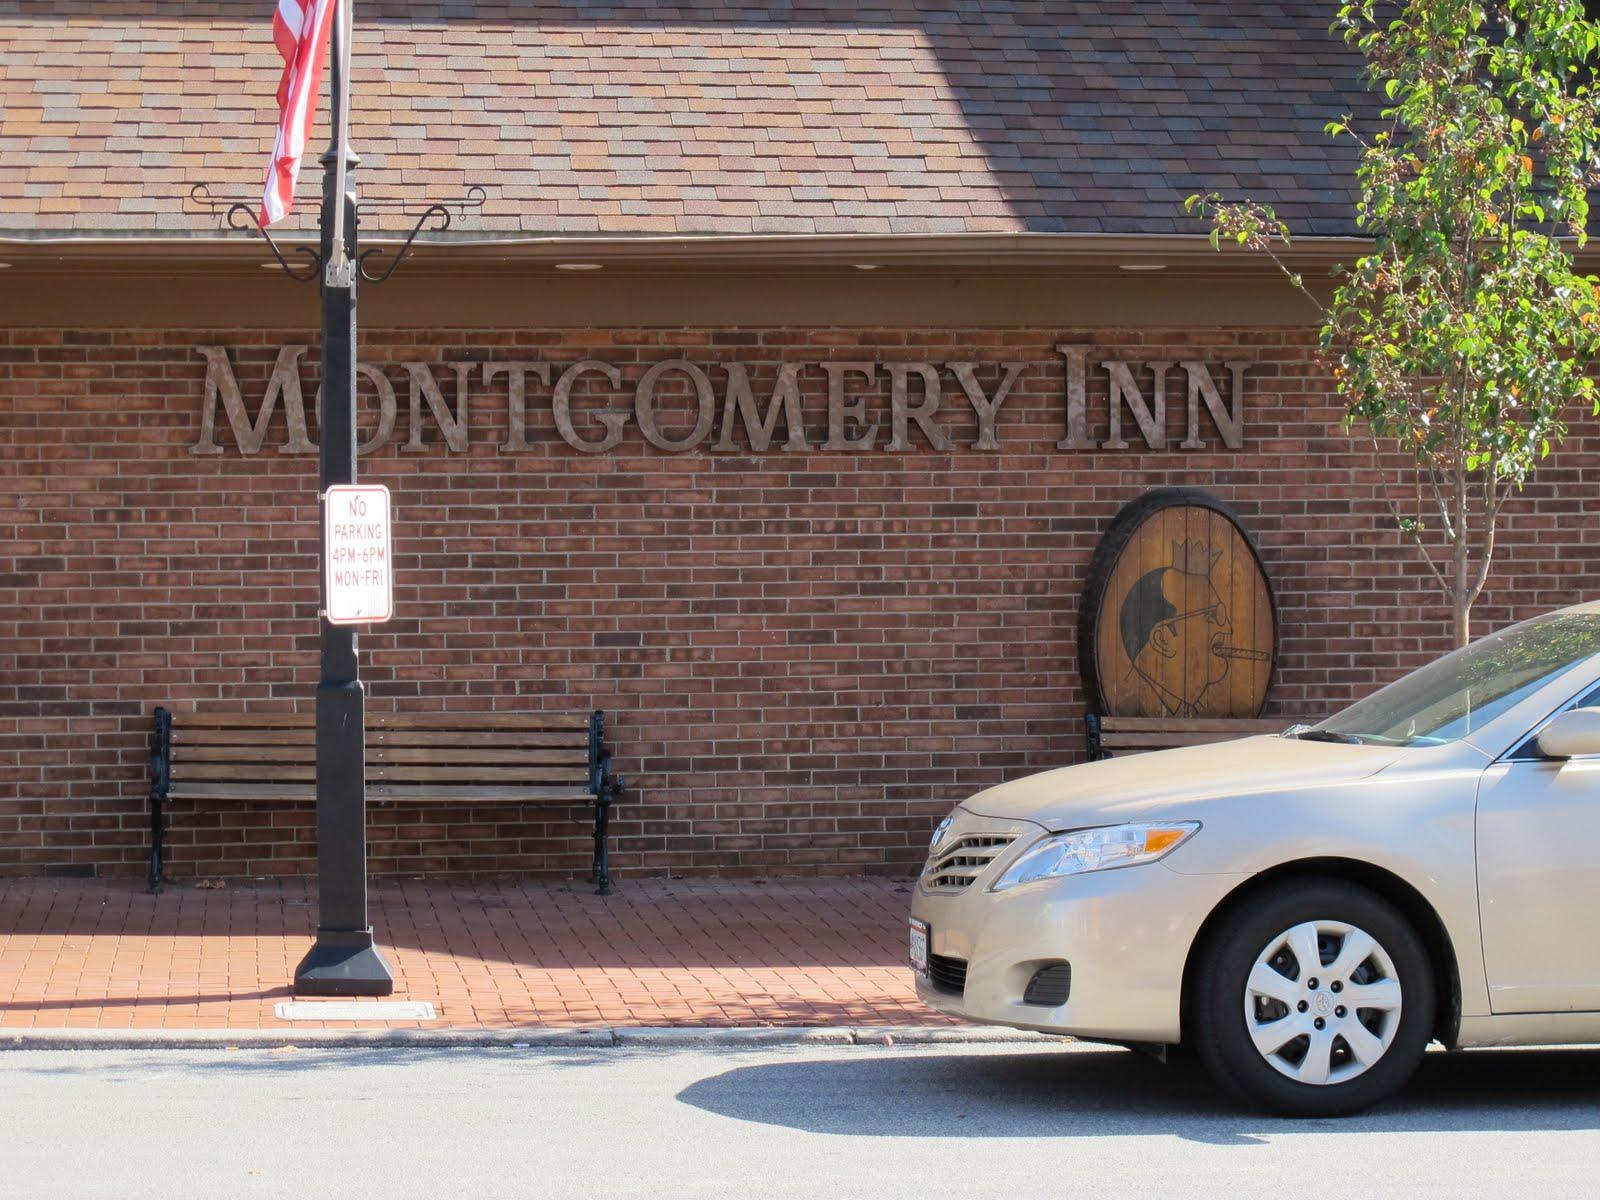 Montgomery Inn - Ohio